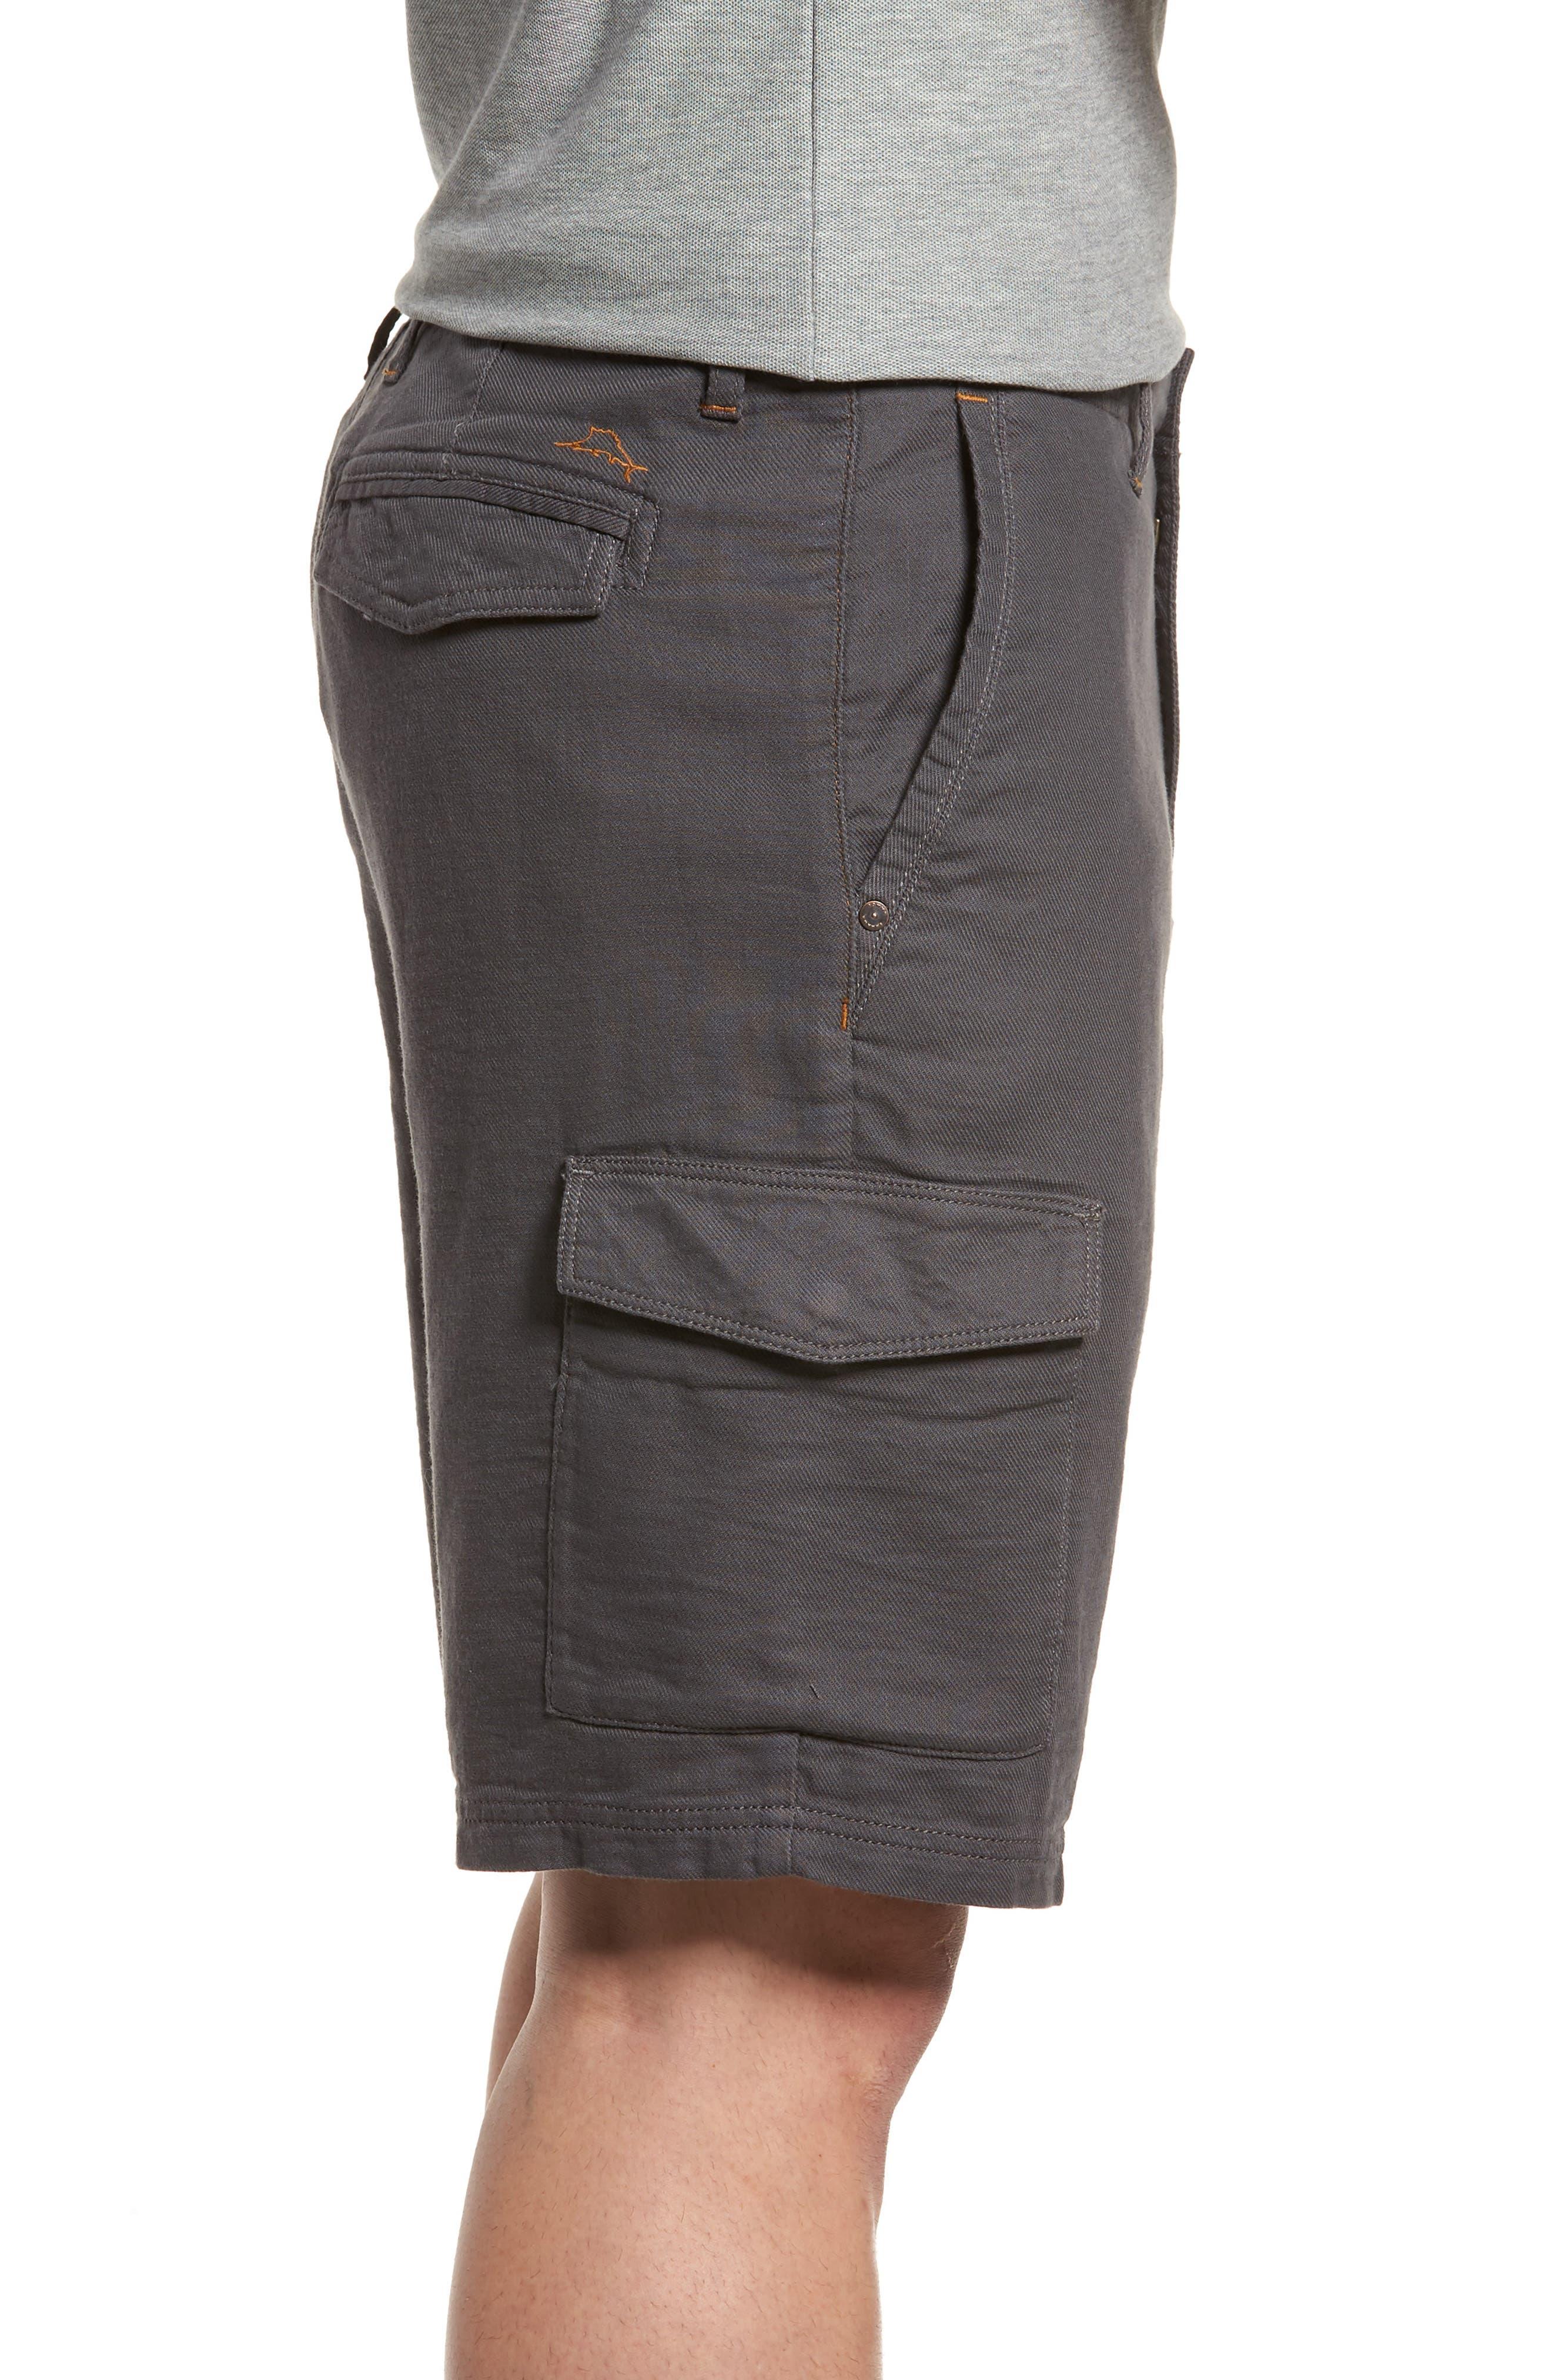 Edgewood Cargo Shorts,                             Alternate thumbnail 3, color,                             050